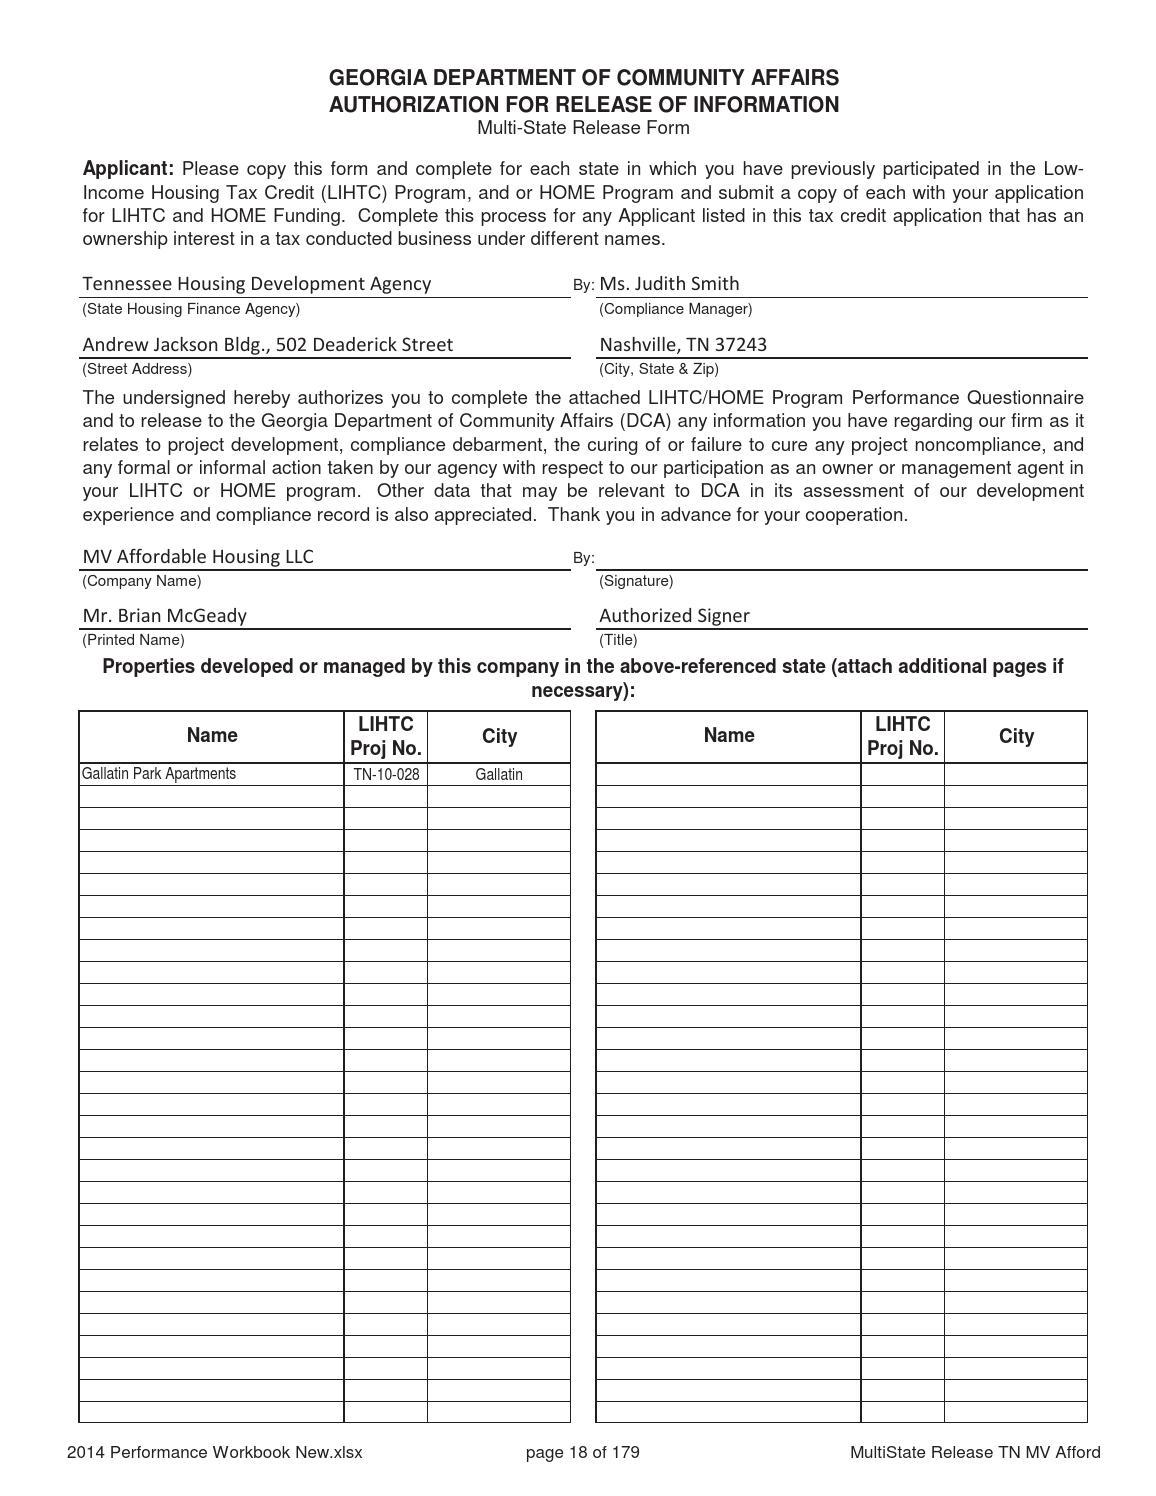 170703pinelakeperformancecompliancehistory by Pine Lake